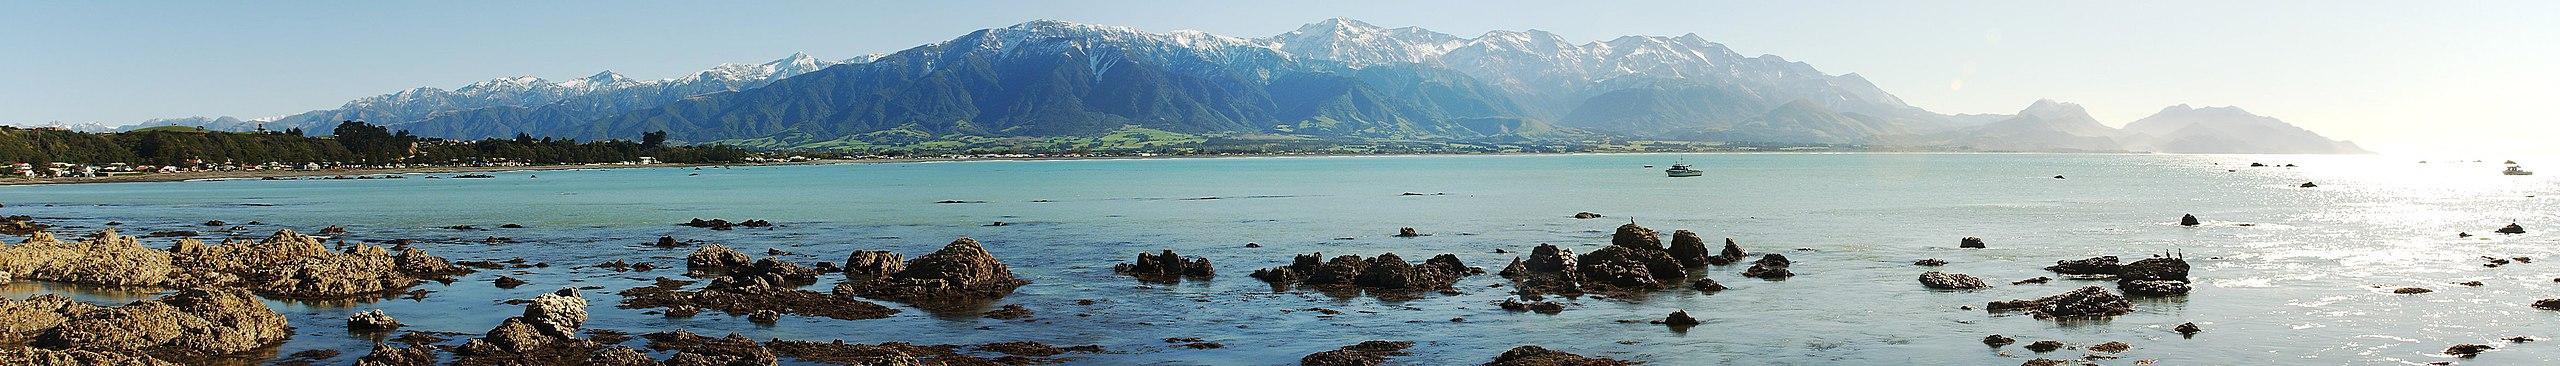 Sites de rencontres spirituelles NZ